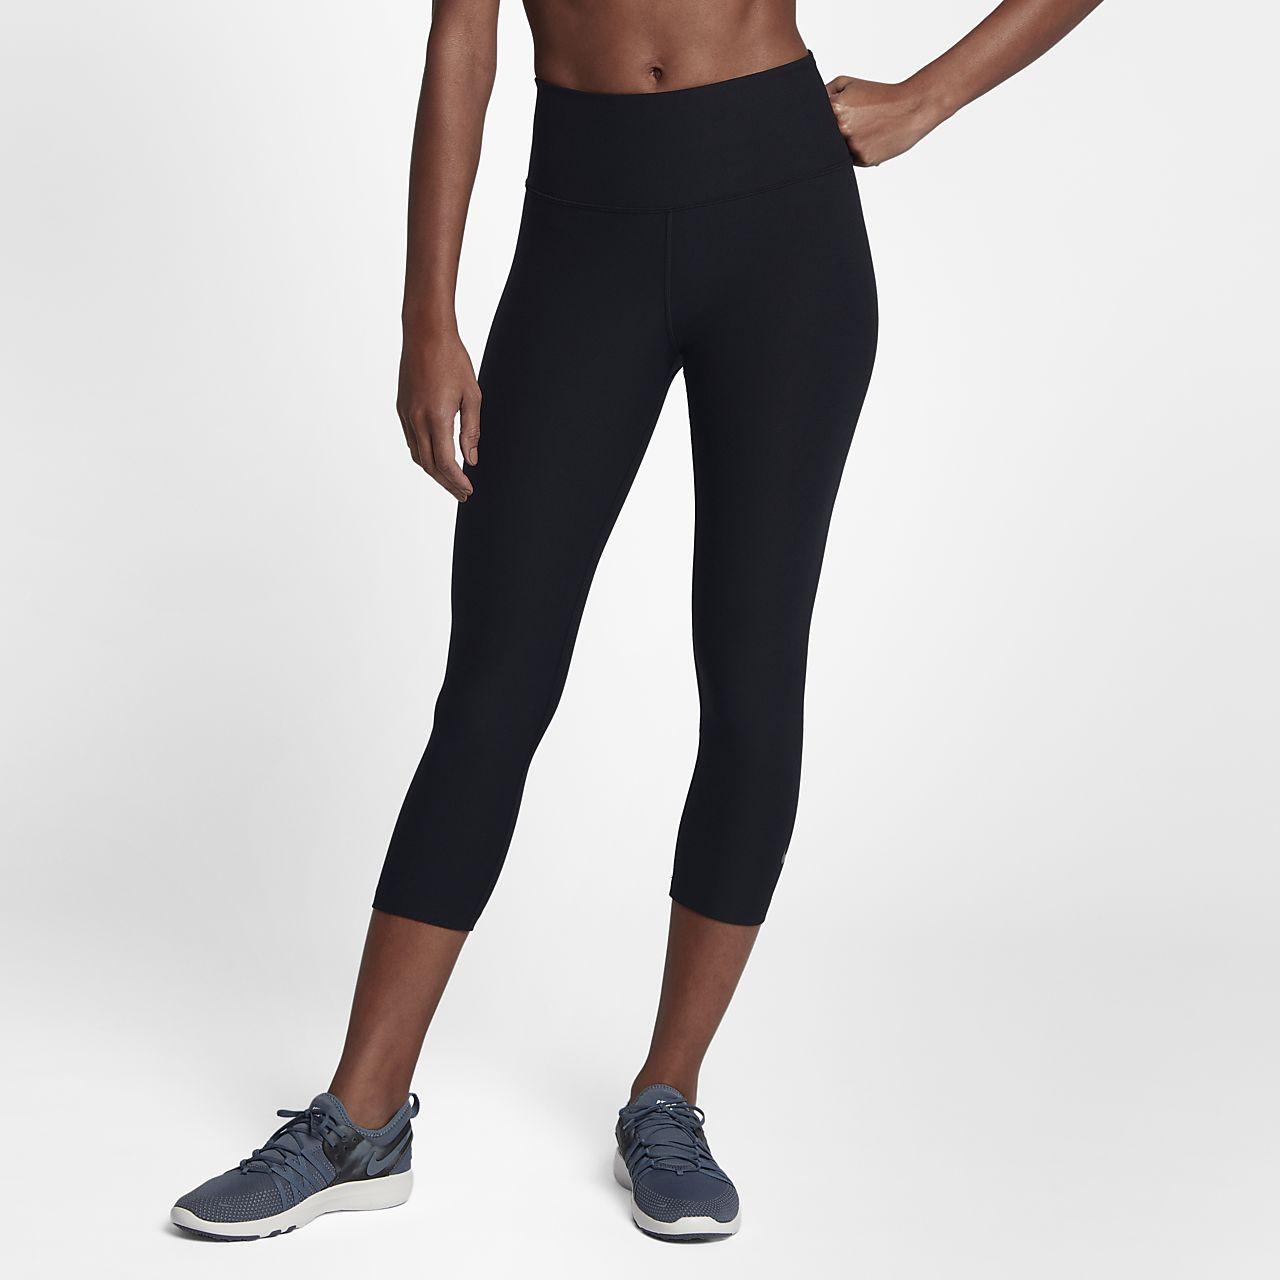 Nike Sculpt Hyper Women's High Rise Training Crops